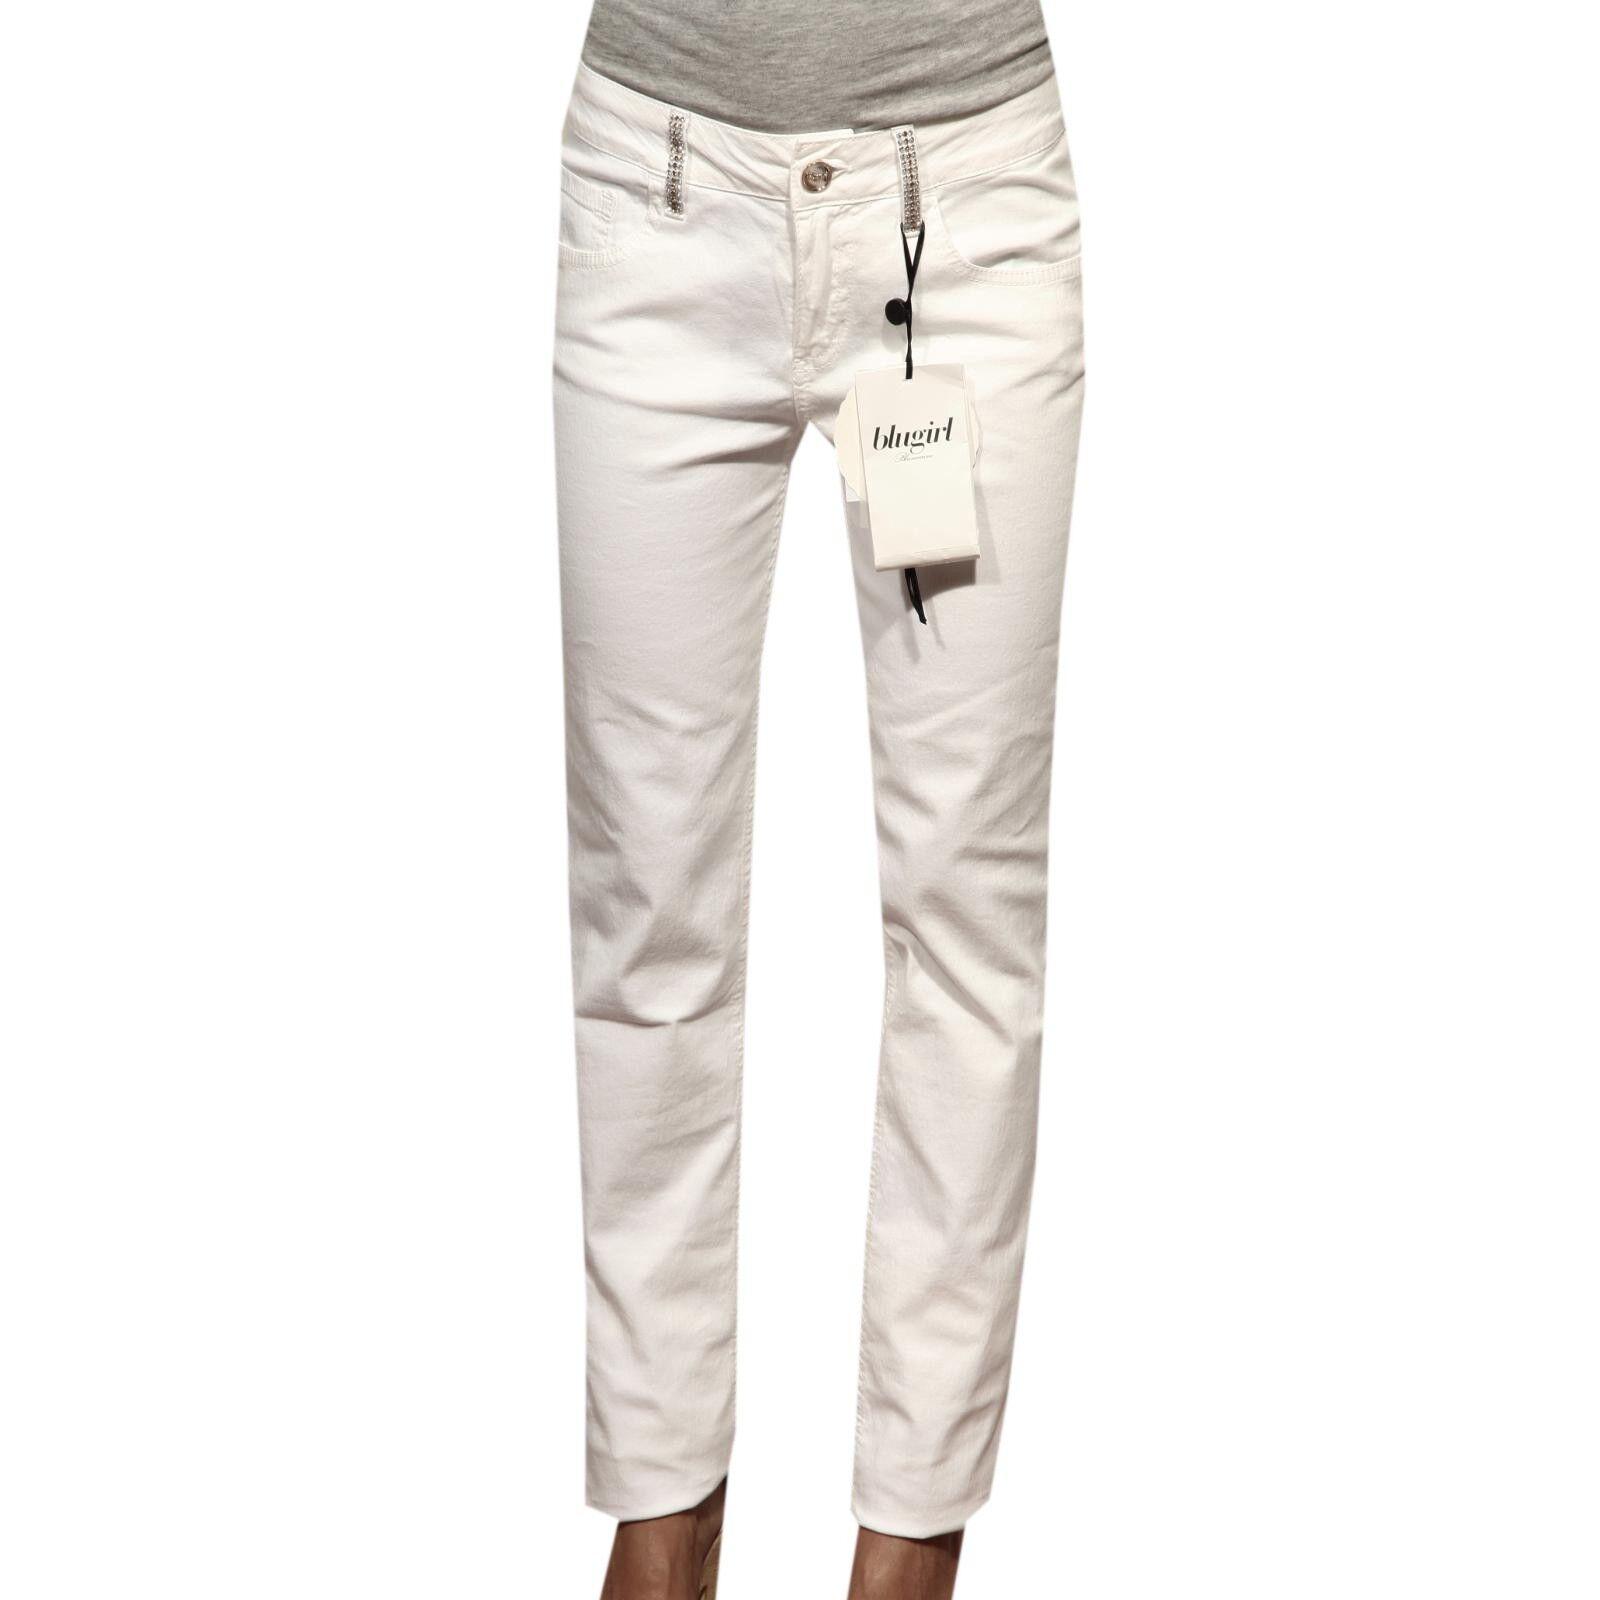 83155 jeans BlauGIRL BlauMARINE pantaloni lunghi damen trousers damen